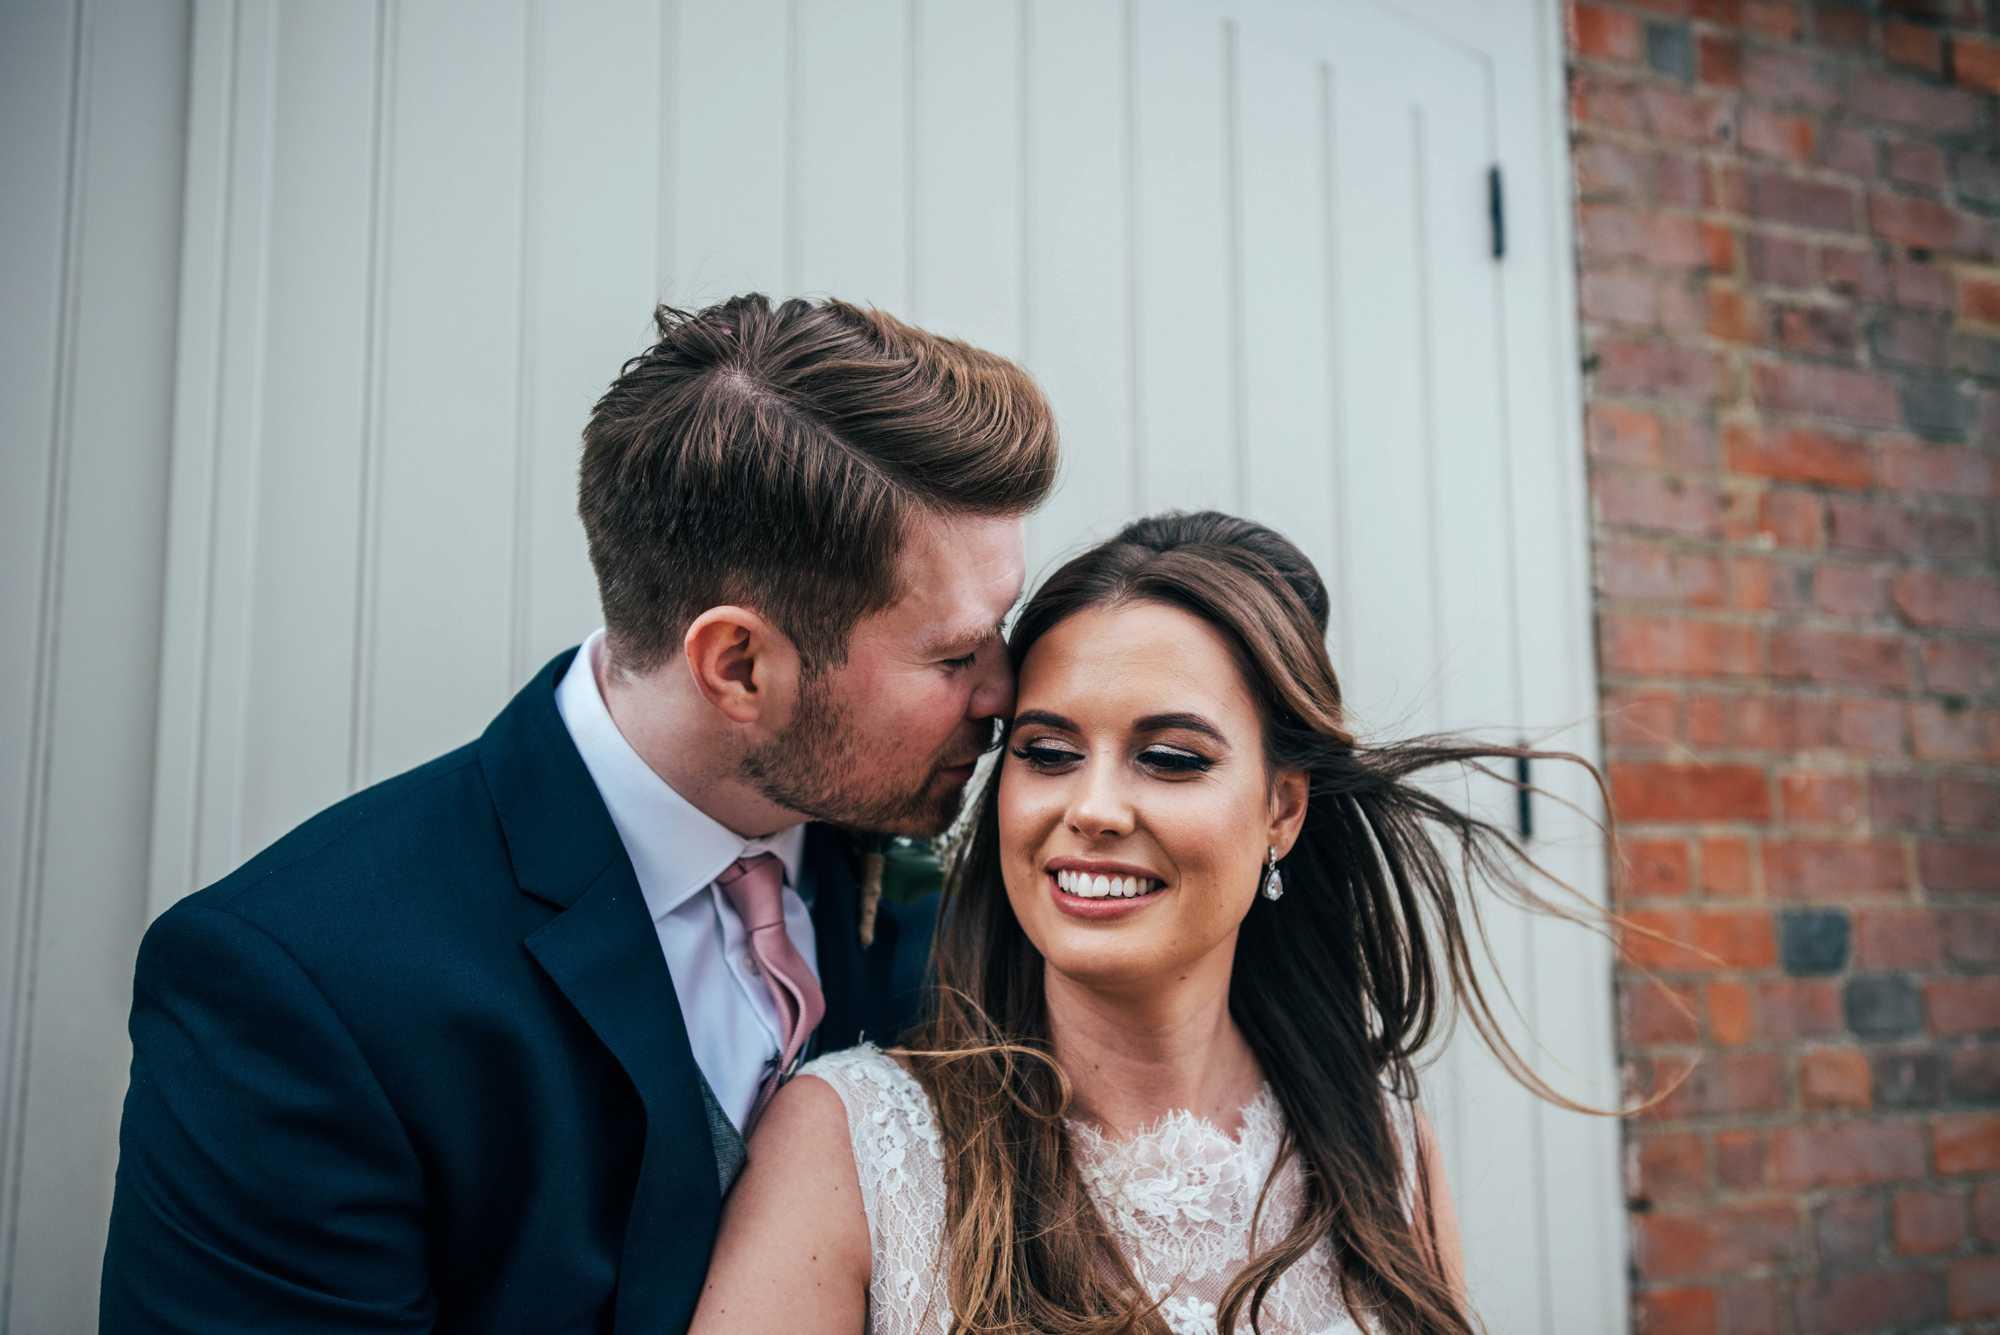 Rustic Barn Wedding with Contemporary twist at Blake Hall. Bride wears Pronovias. Essex Documentary Wedding Photographer.